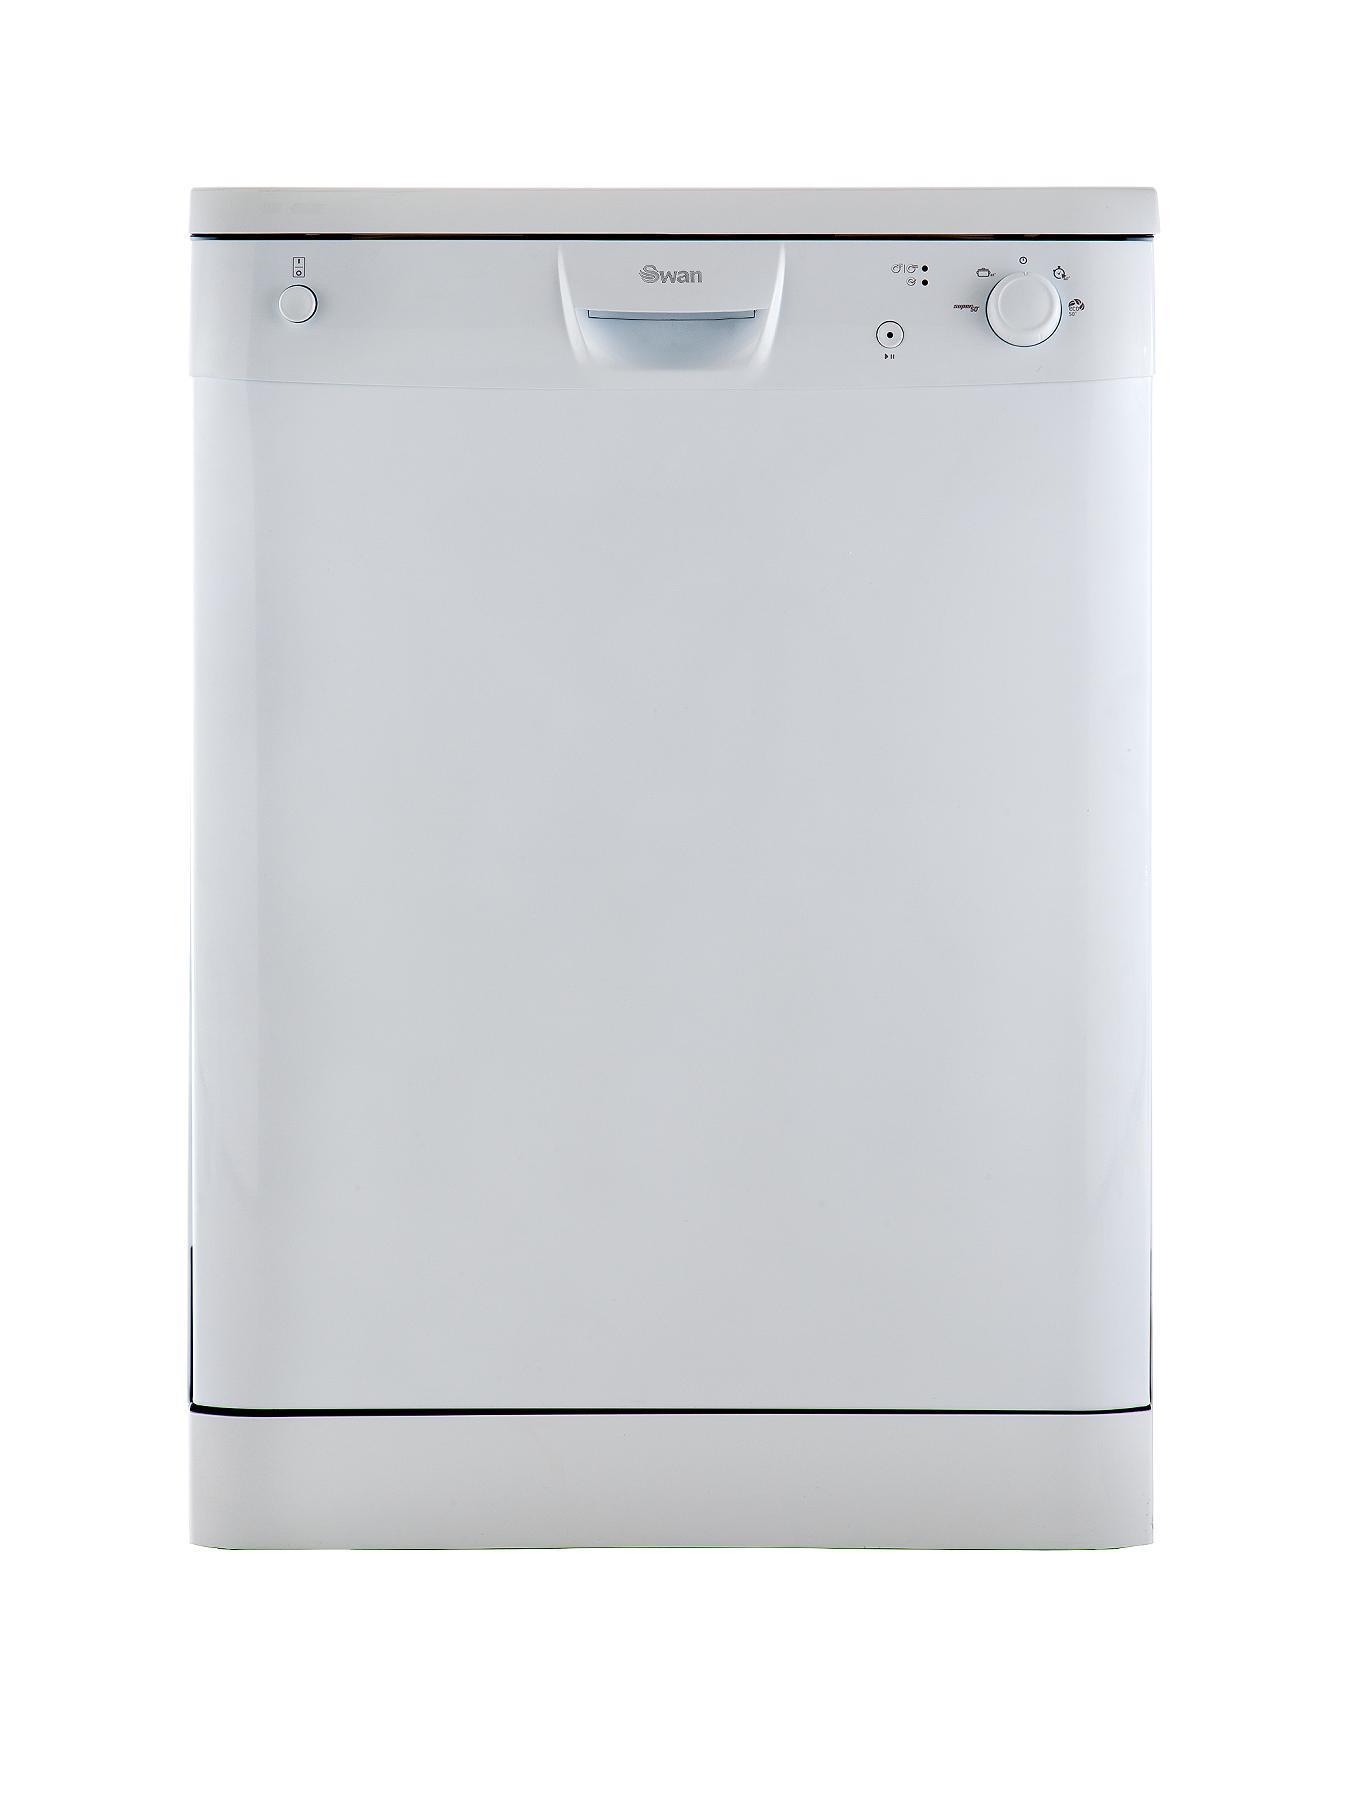 SDW2020W 12 Place Full Size Dishwasher - White at Littlewoods